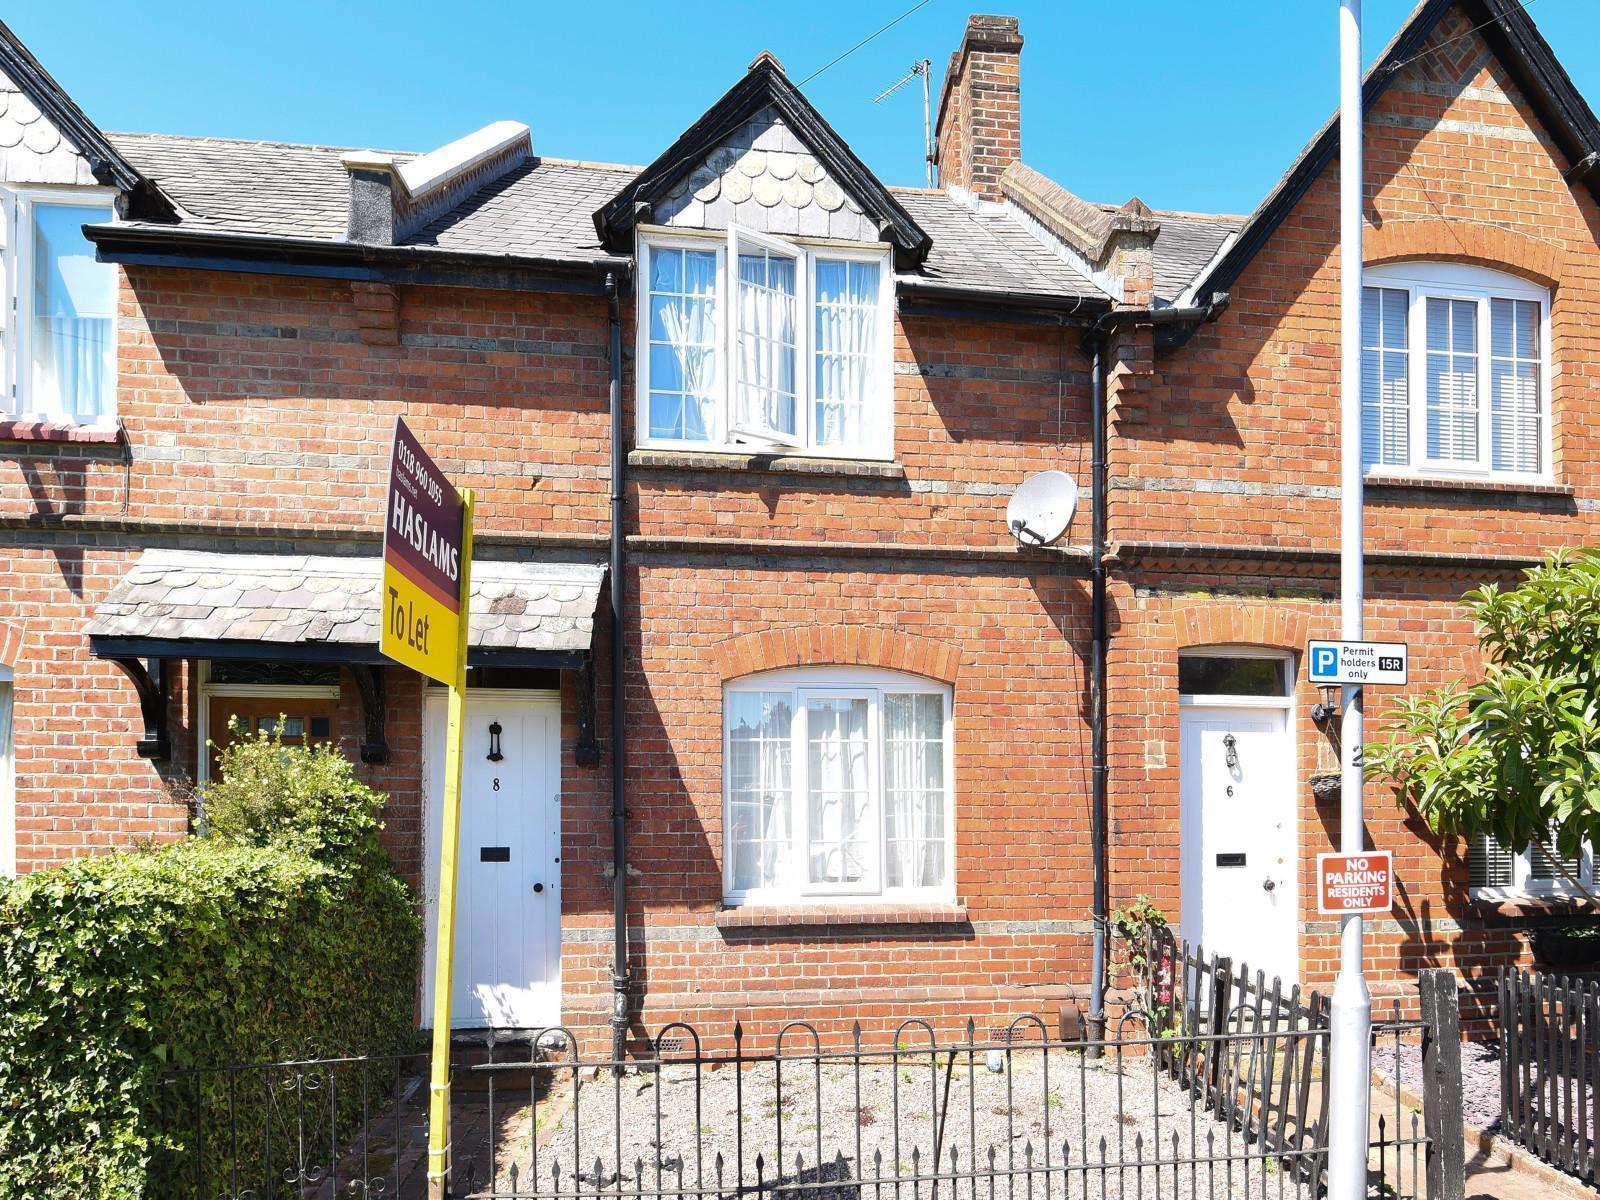 8 Whitley Park Lane, Reading, RG2 7BE